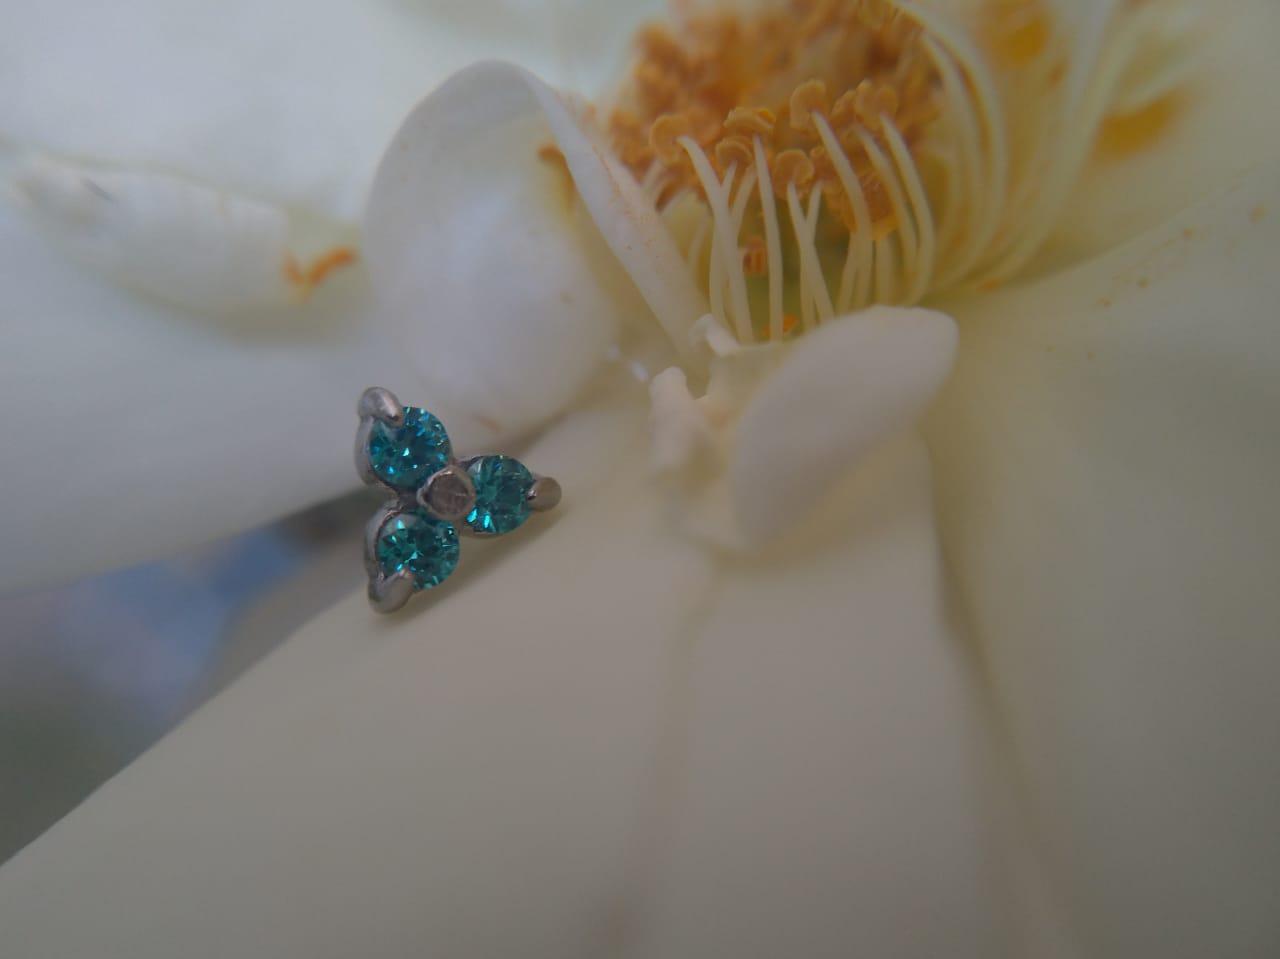 Piercing Magnolia Swarovski Micro Barbell